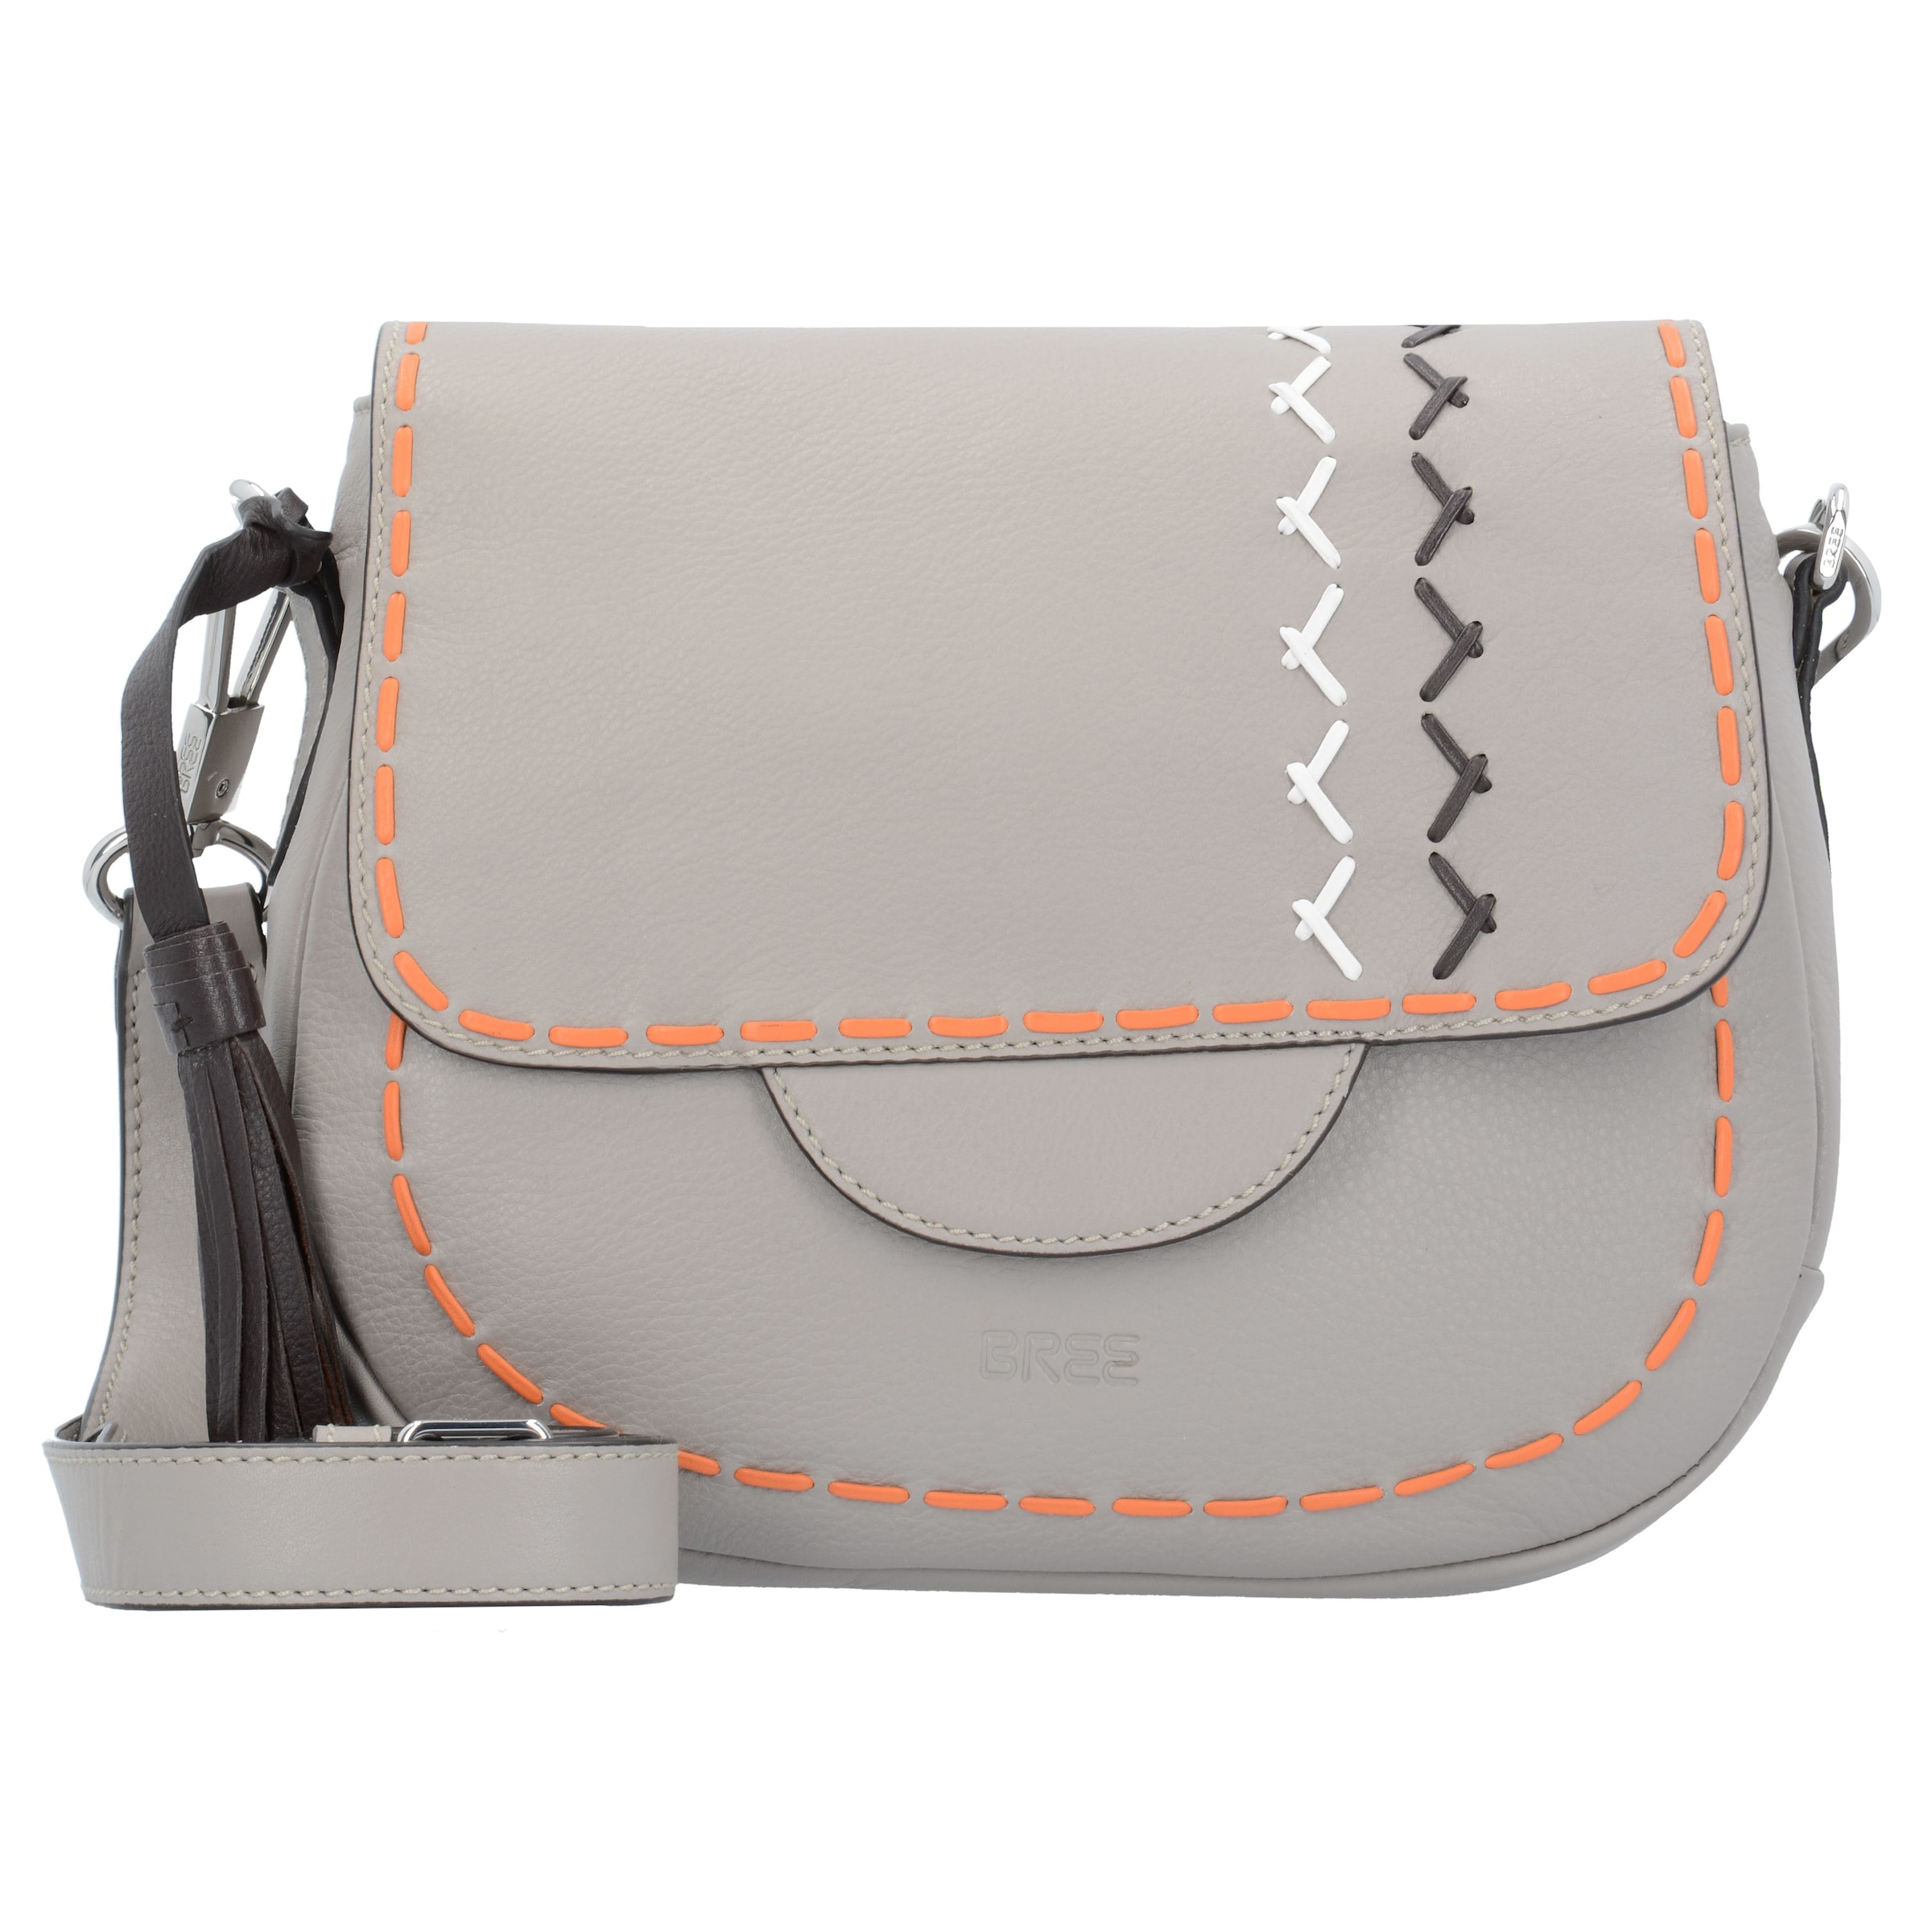 Sac À Bree Mini 1 Bandoulière Bag' 'kano En Gris htsrQdC